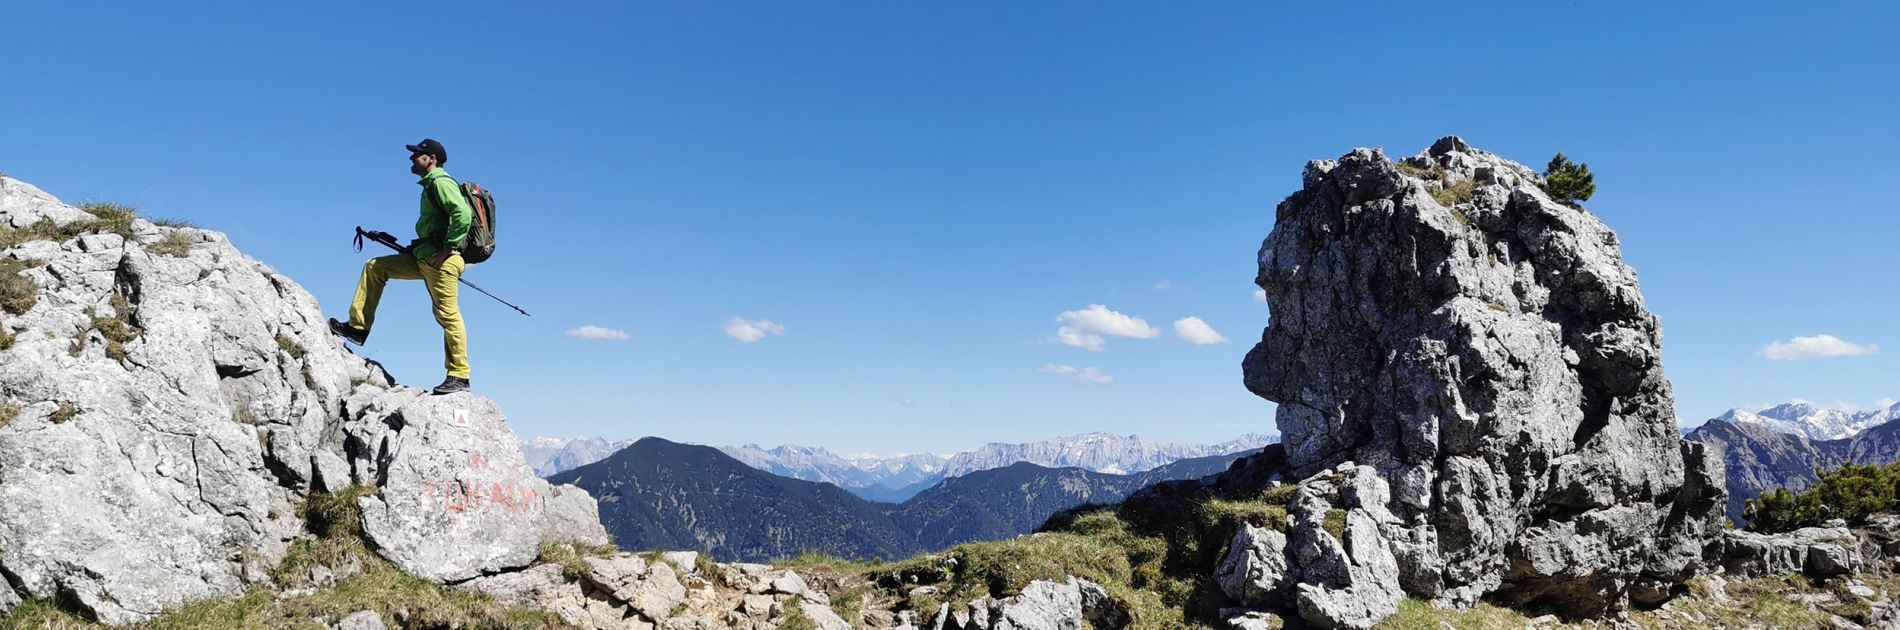 Image photo with the INNOX PRO GTX LO, Ralf Stute Innox Alpen